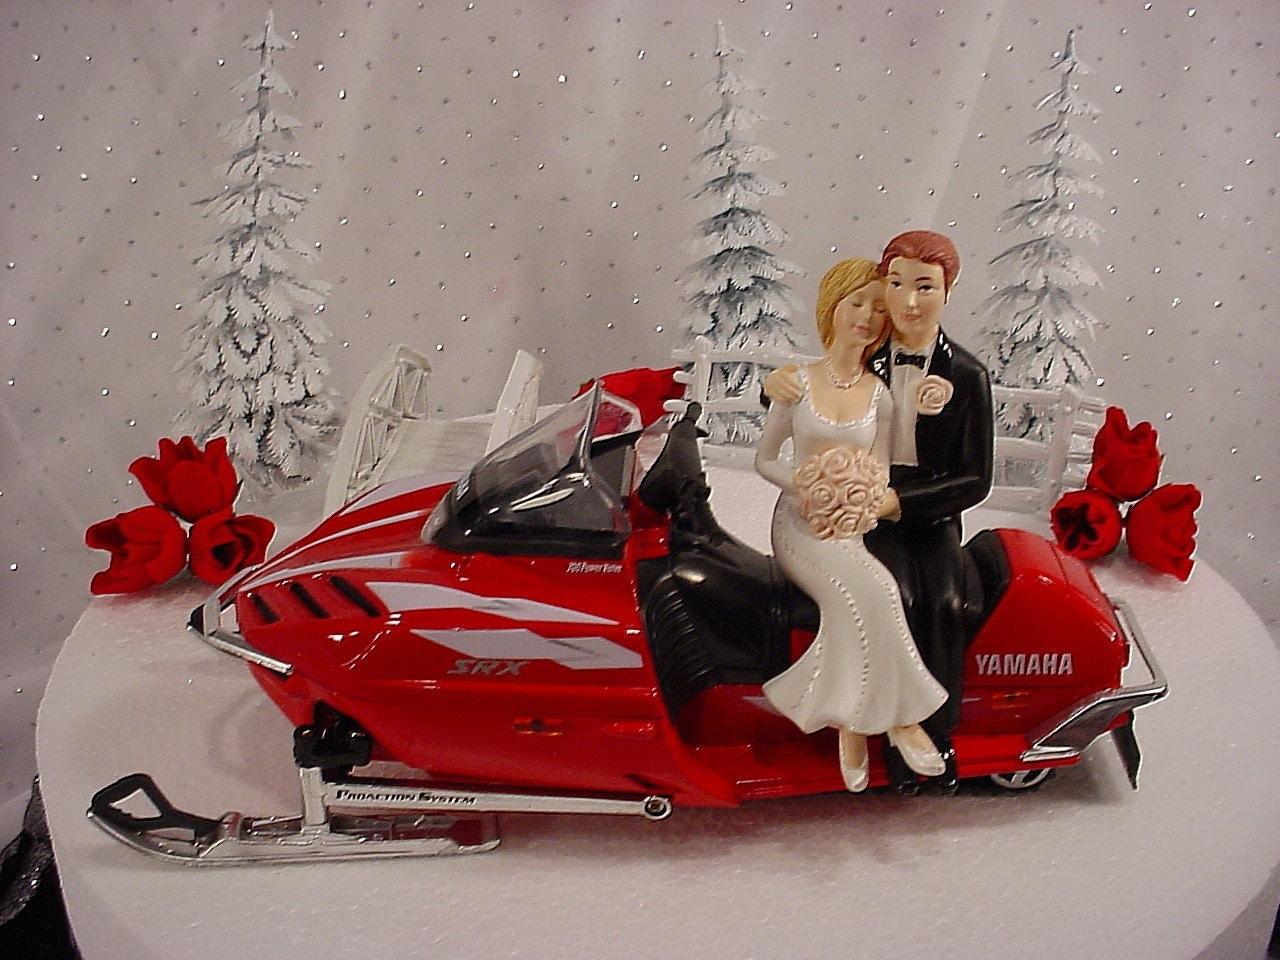 Red Yamaha Srx 700 Snowmobile Snow Sports Lover Groom S